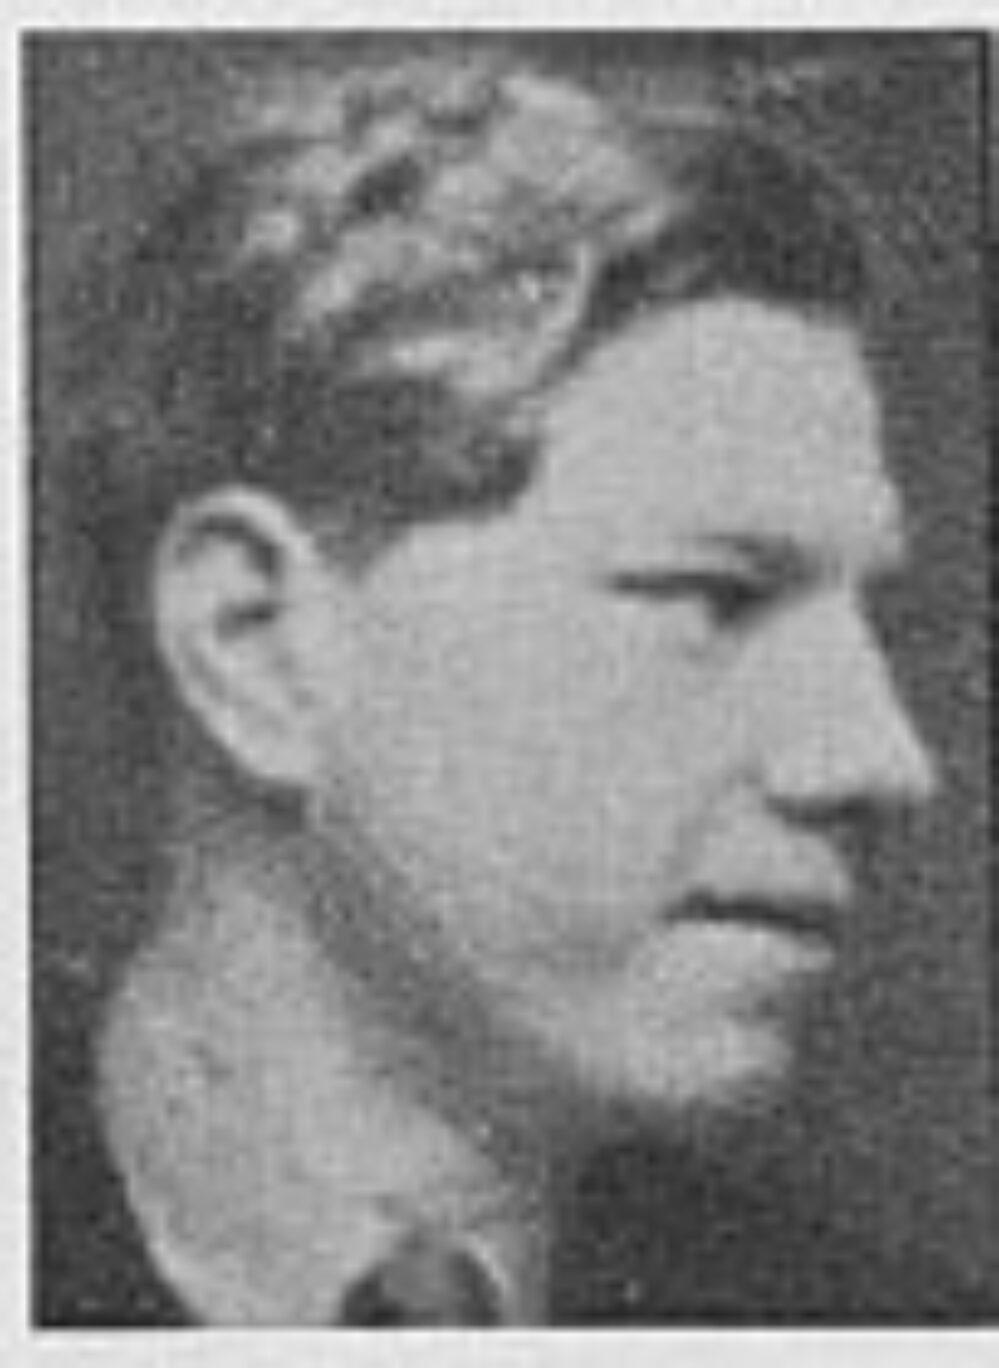 Leif Sigurd Frithjof Langemyhr Johansen